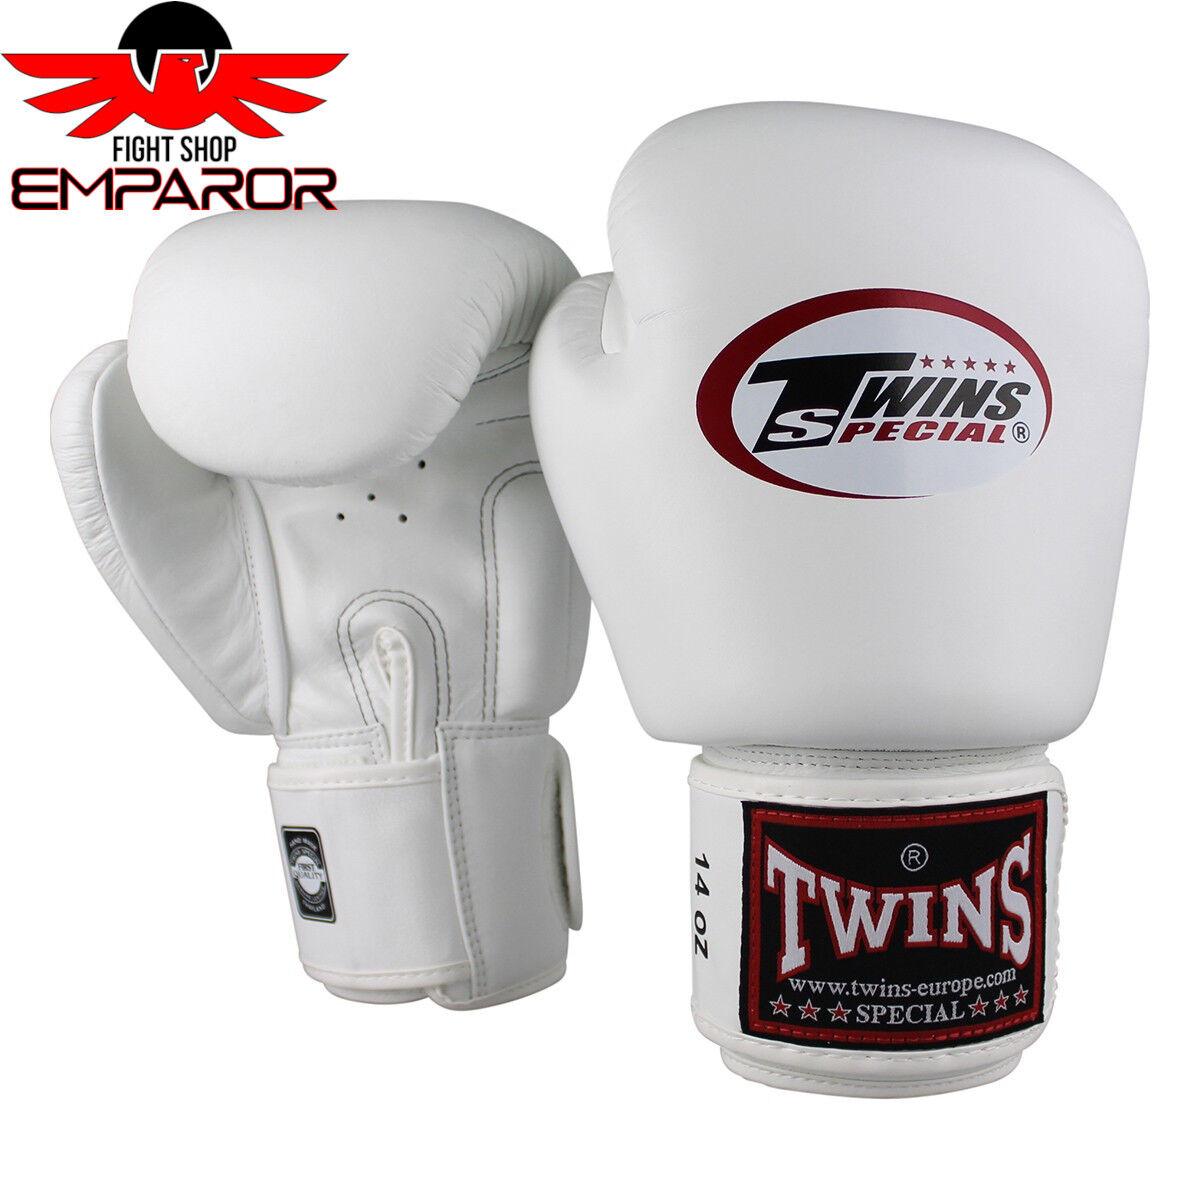 Twins Special Boxhandschuhe BGVL 3 Weiß Muay Thai Thai Thai Boxen Handschuhe 10-16oz Leder d9d52f